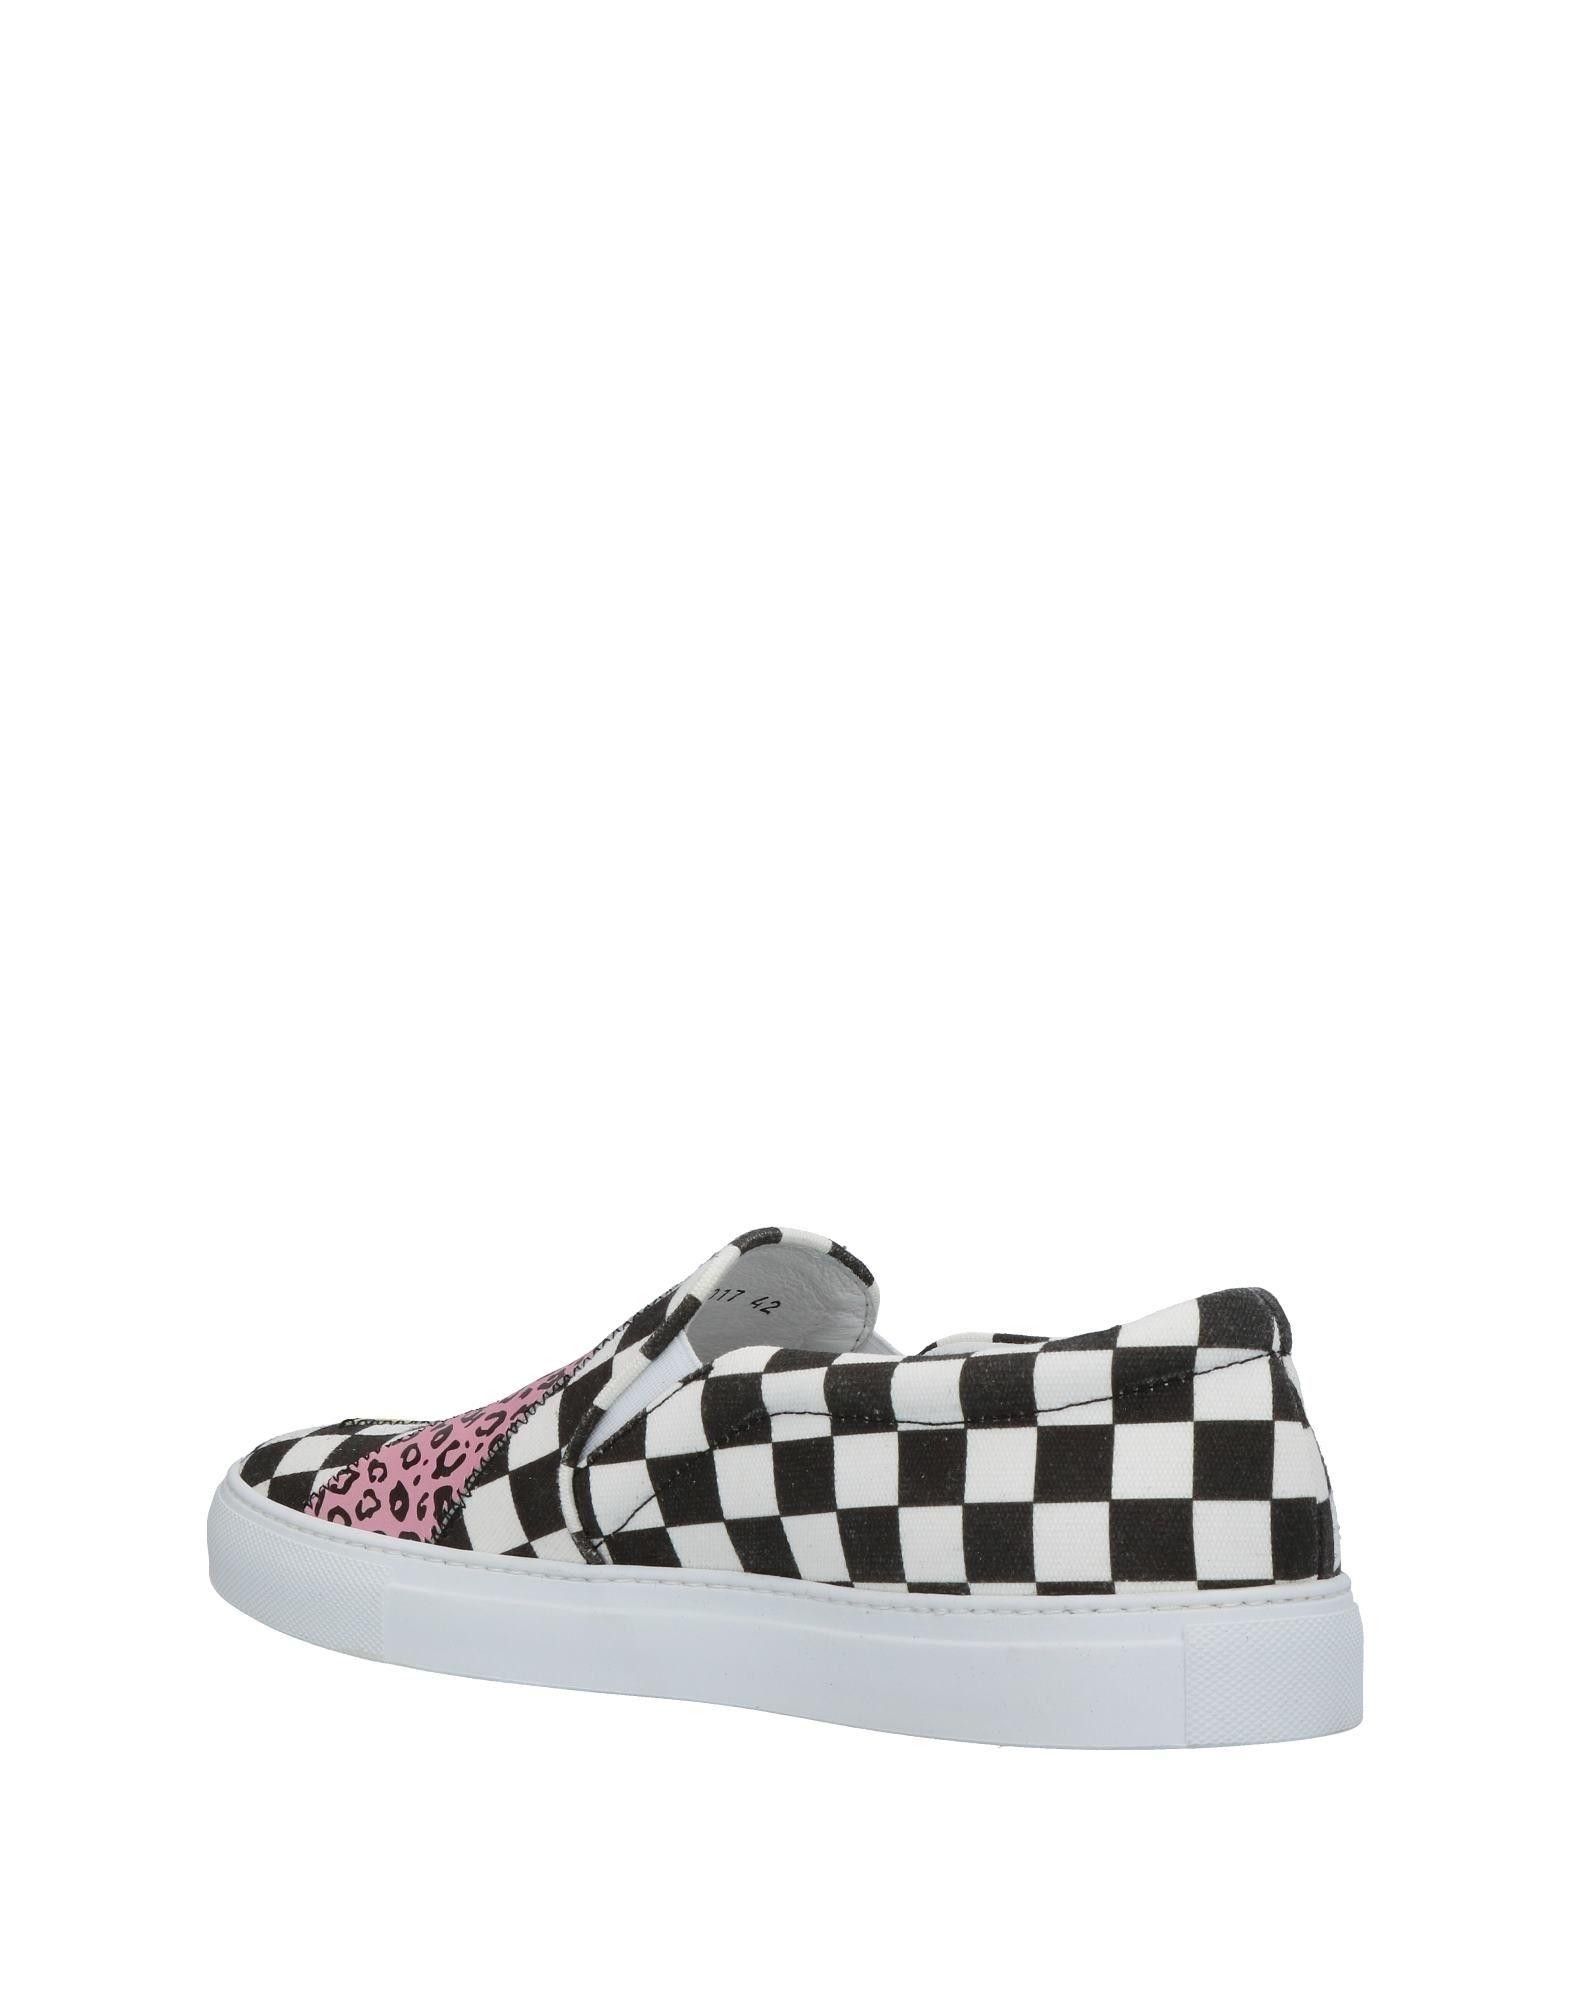 Joshua*S Sneakers Schuhe Herren  11368525IV Heiße Schuhe Sneakers 2589db